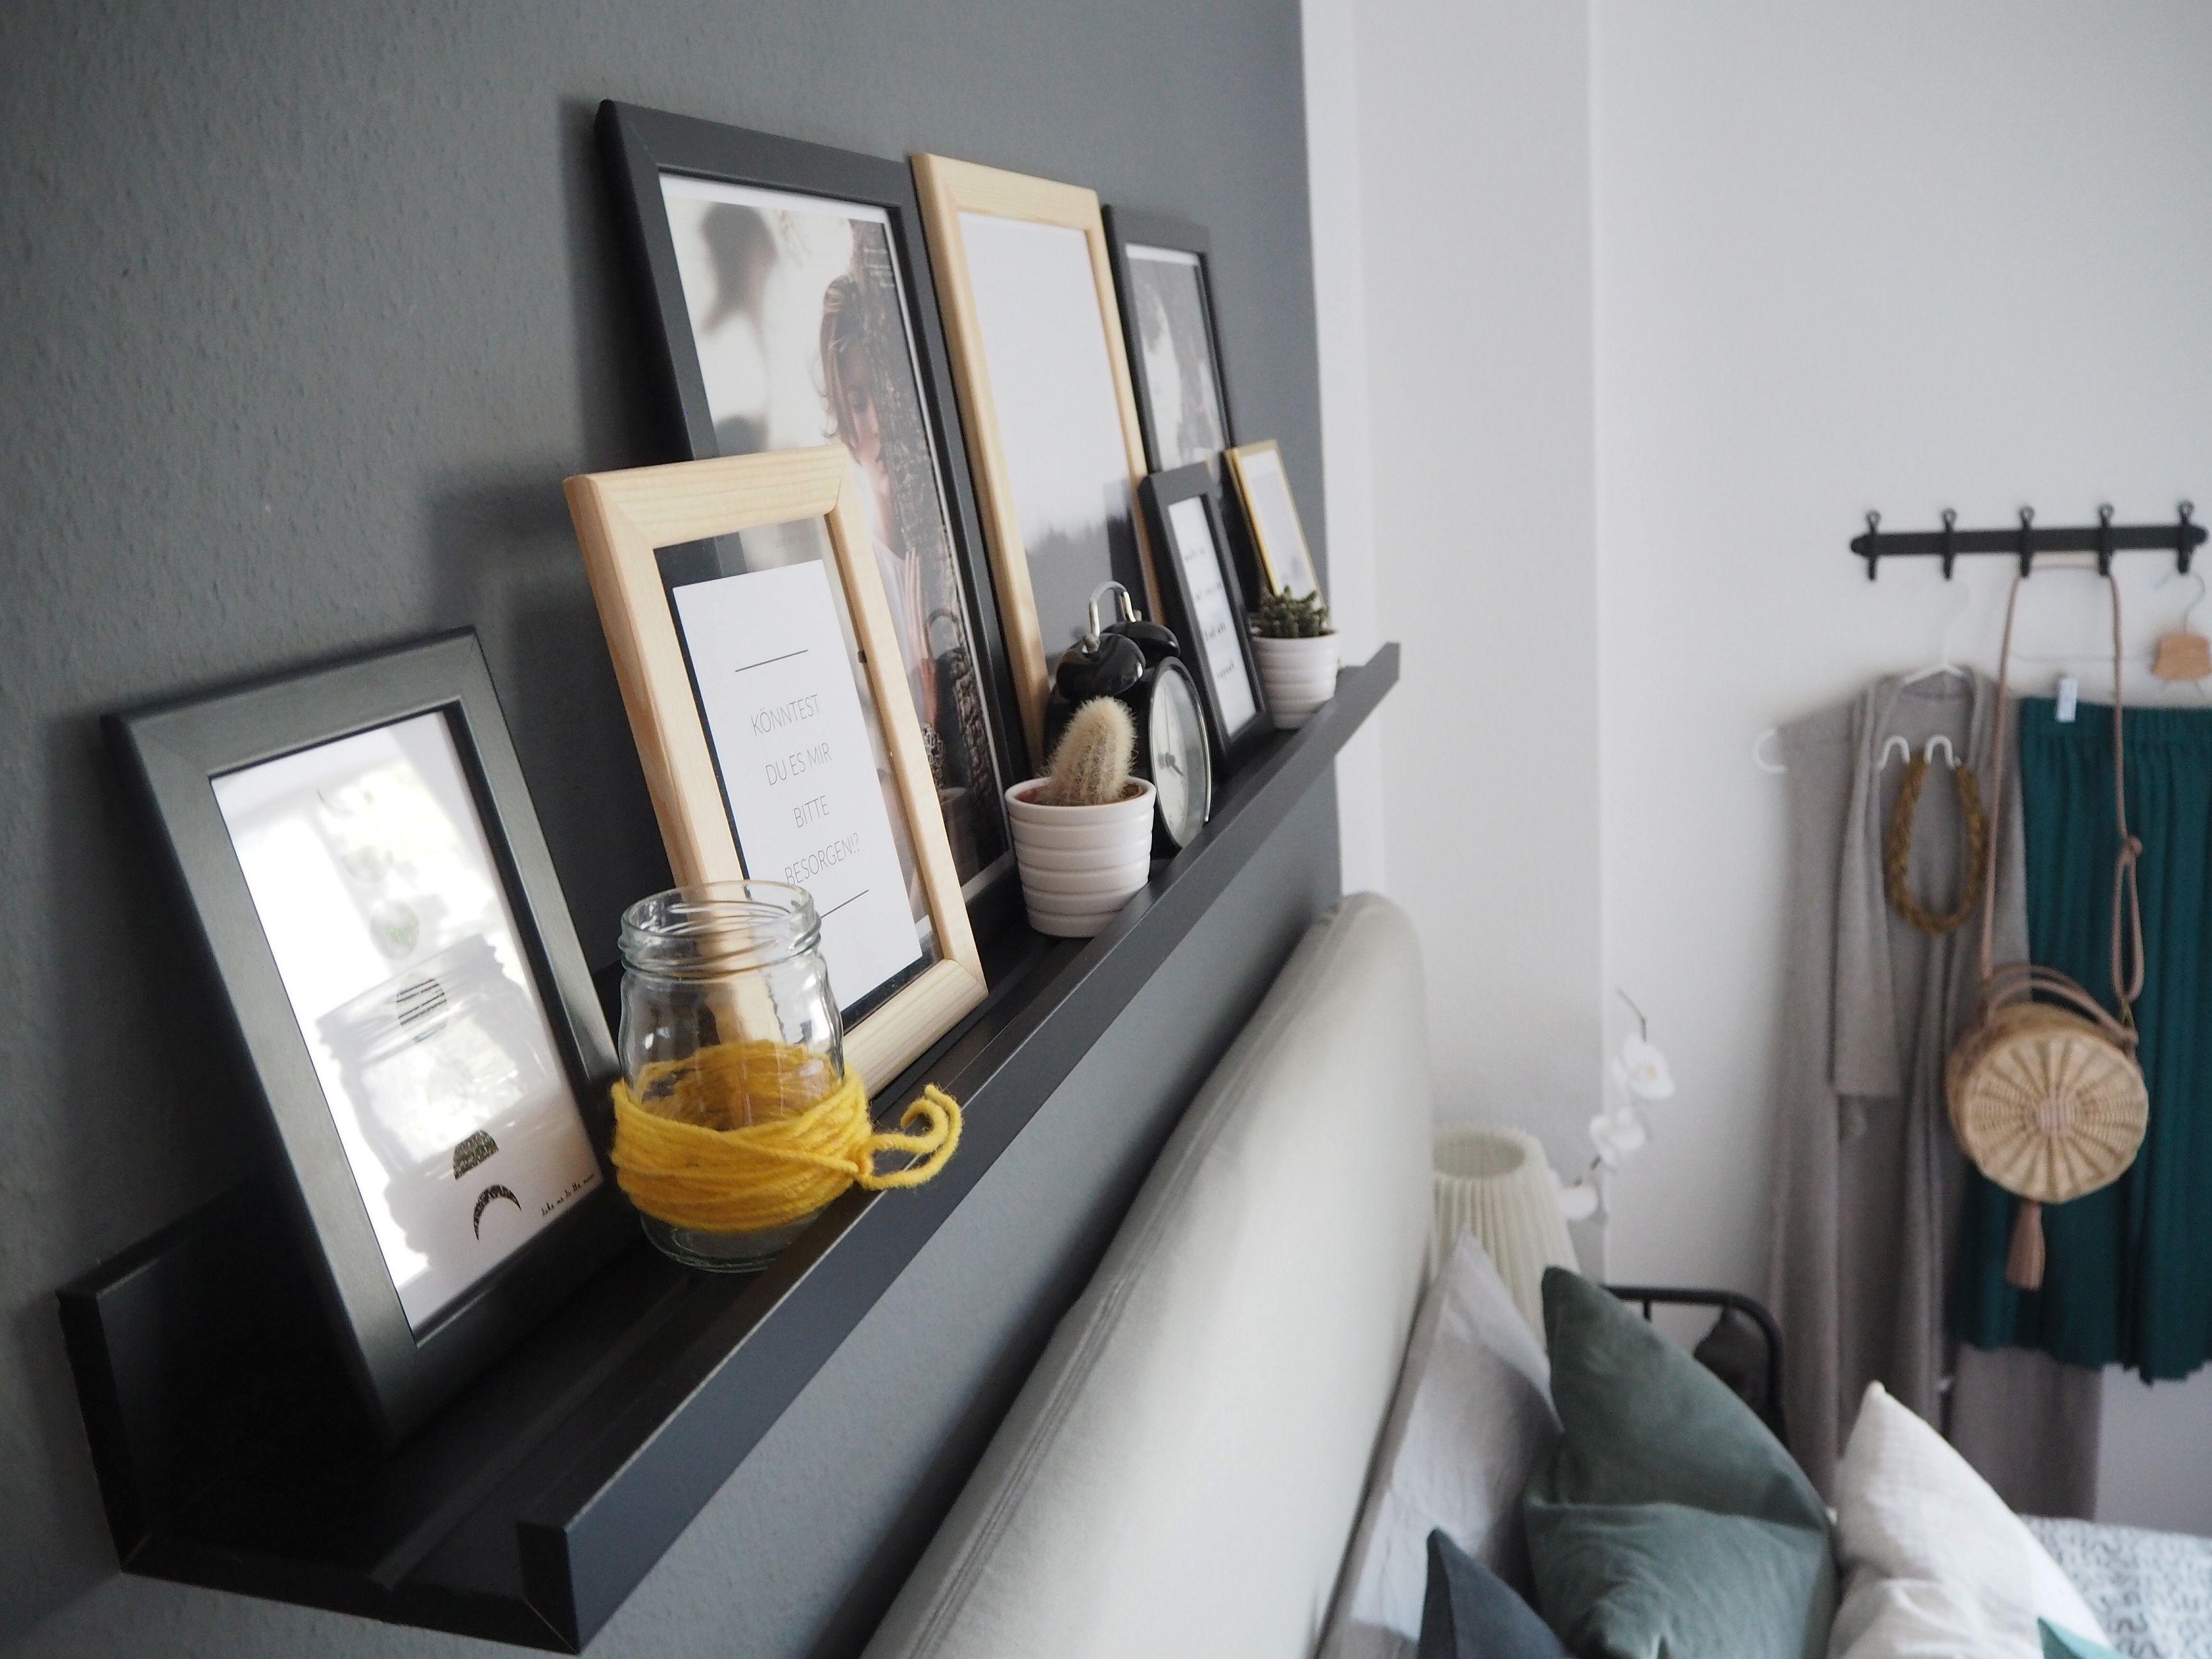 2018-06-skoen-och-kreativ-interior-schlafzimmer-wandgestaltung-pixers-gruen (4)